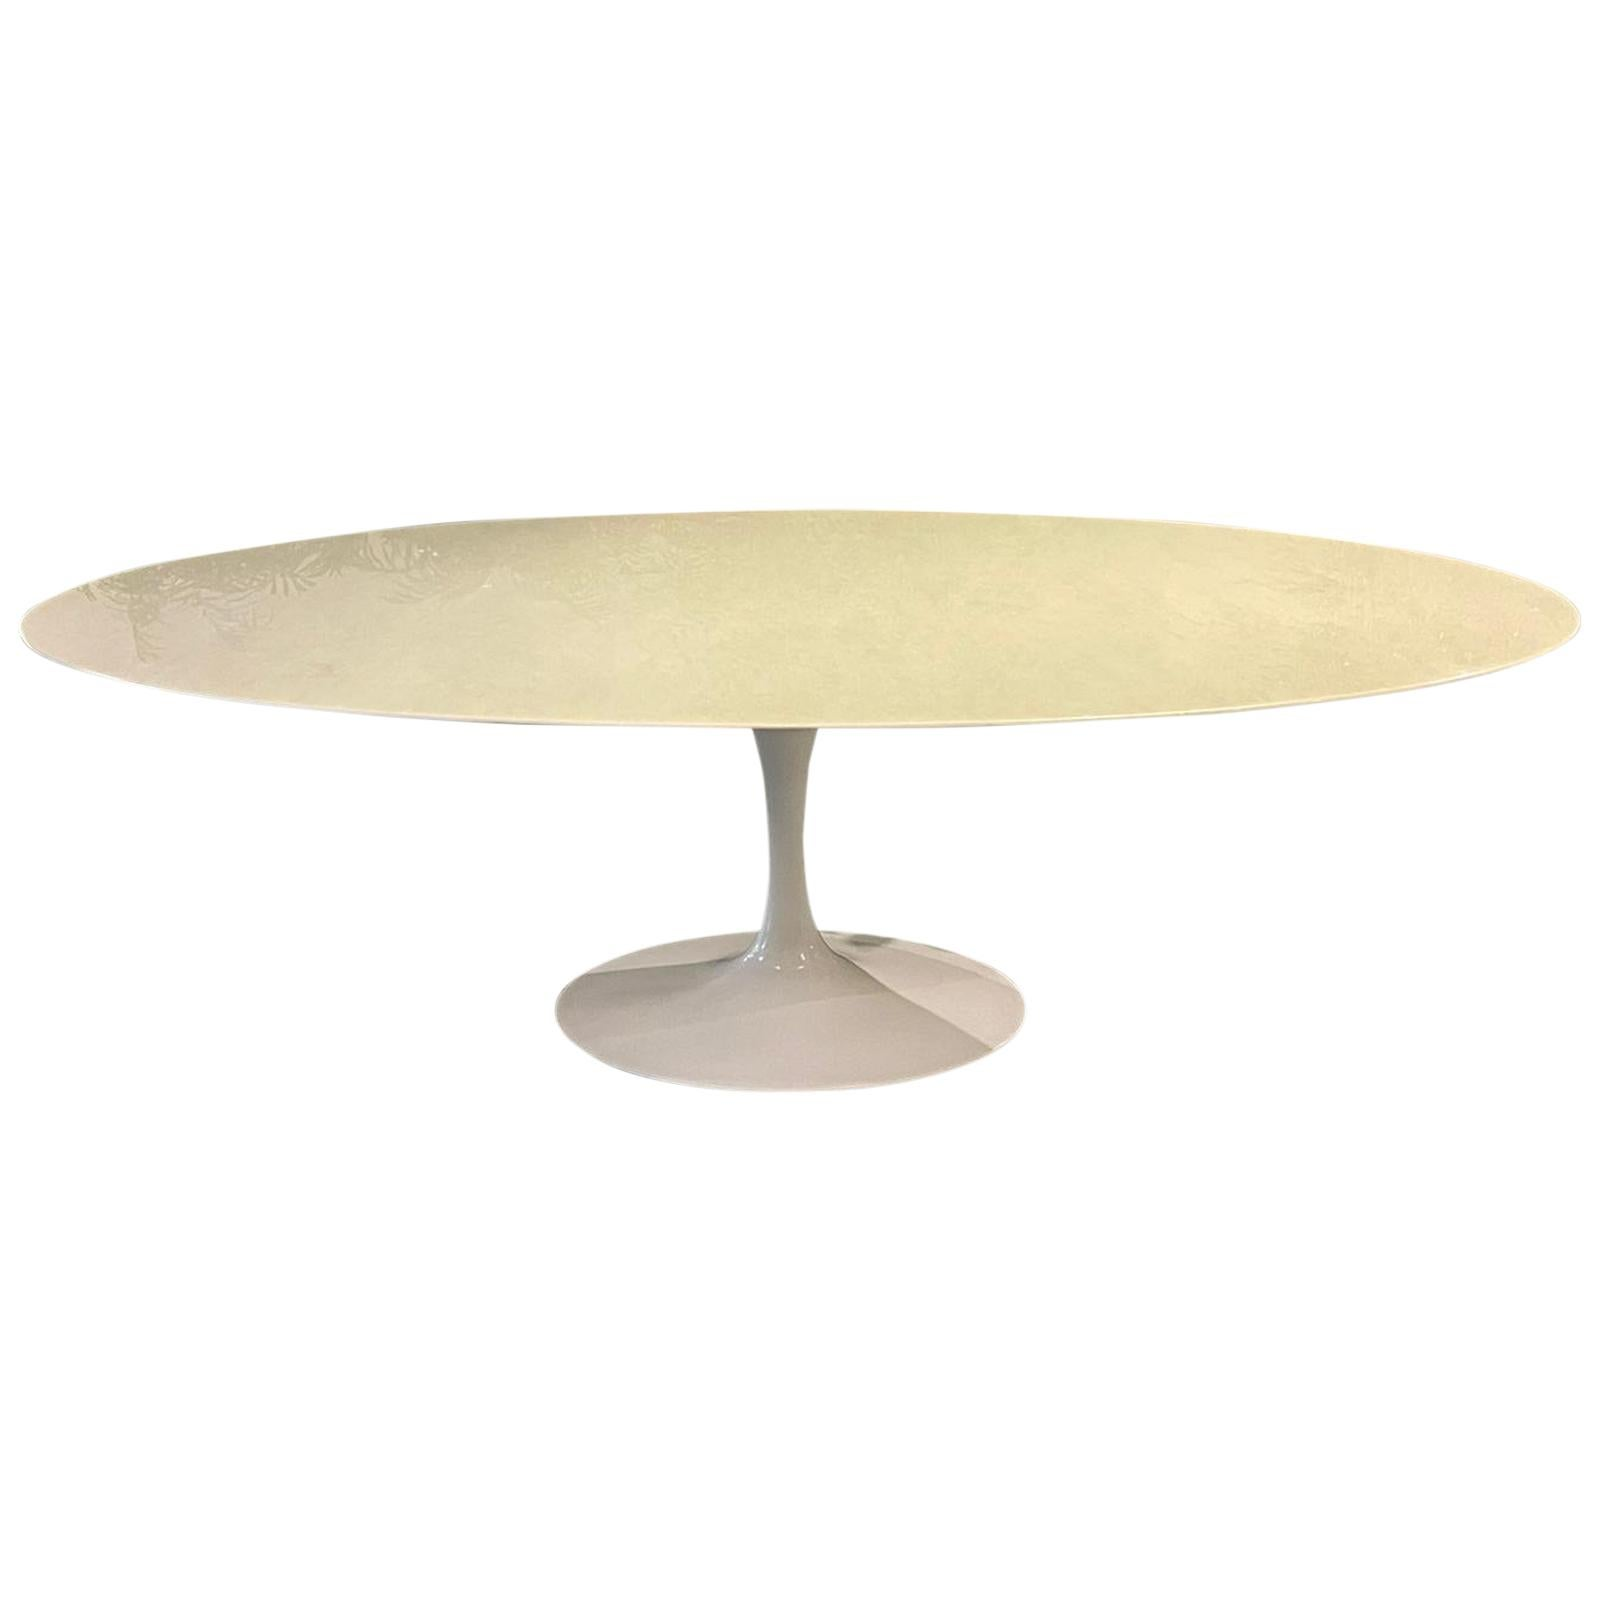 Eero Saarinen Knoll Oval Dining White Marble Table Metal, Italy, 1970s